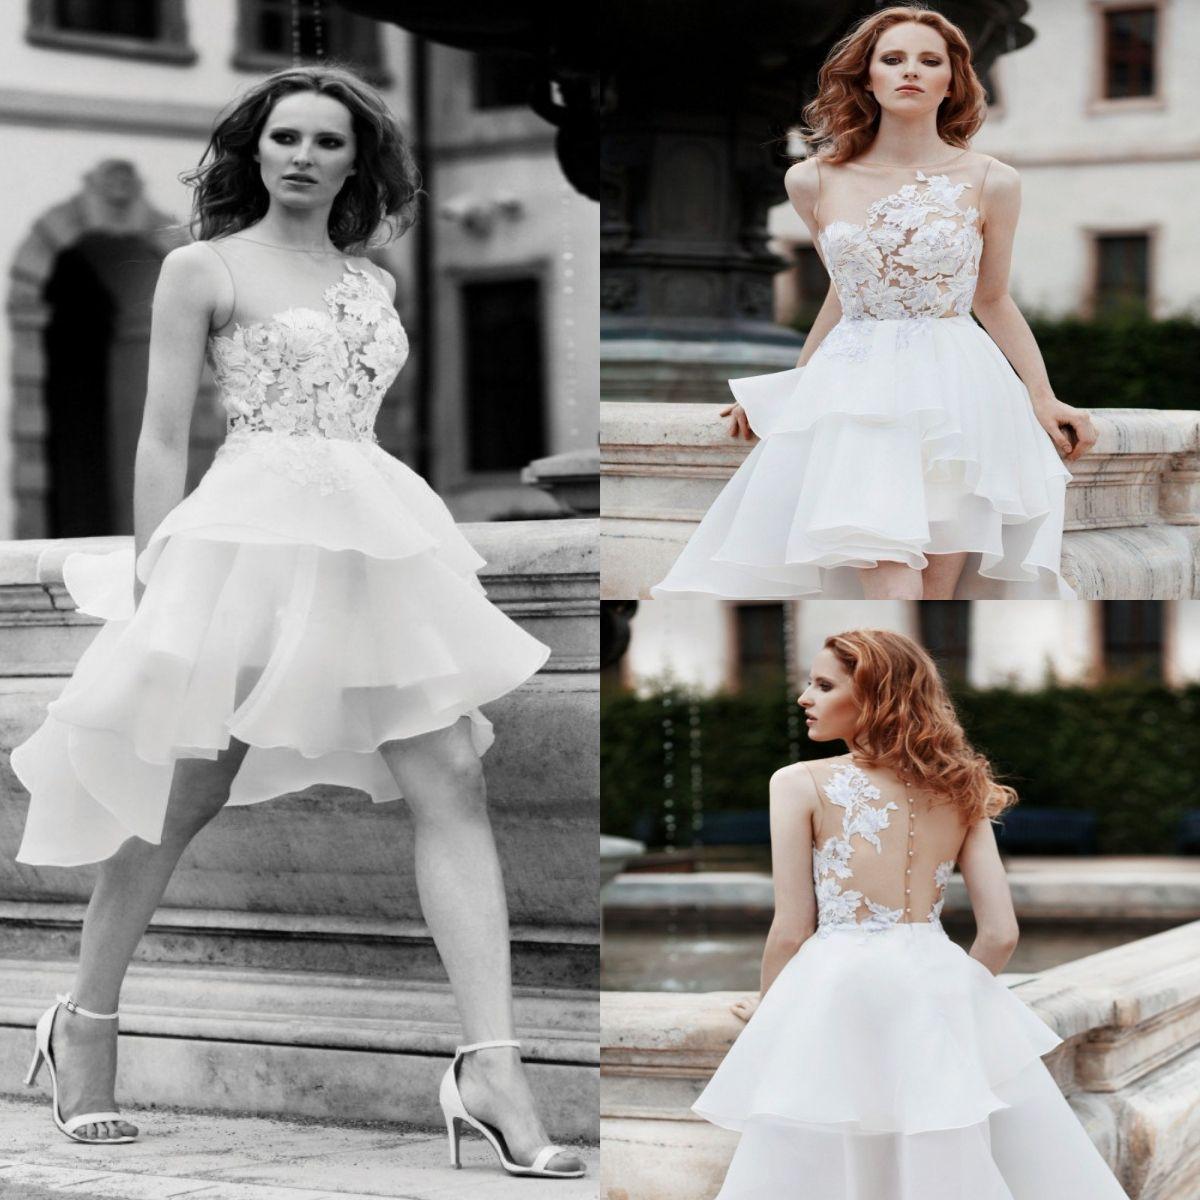 Designer Short Knee Length Wedding Dresses Top Applique Fl Illusion Ruffles  Organza Country Bridal Gown Sleeves 679ddb69a709